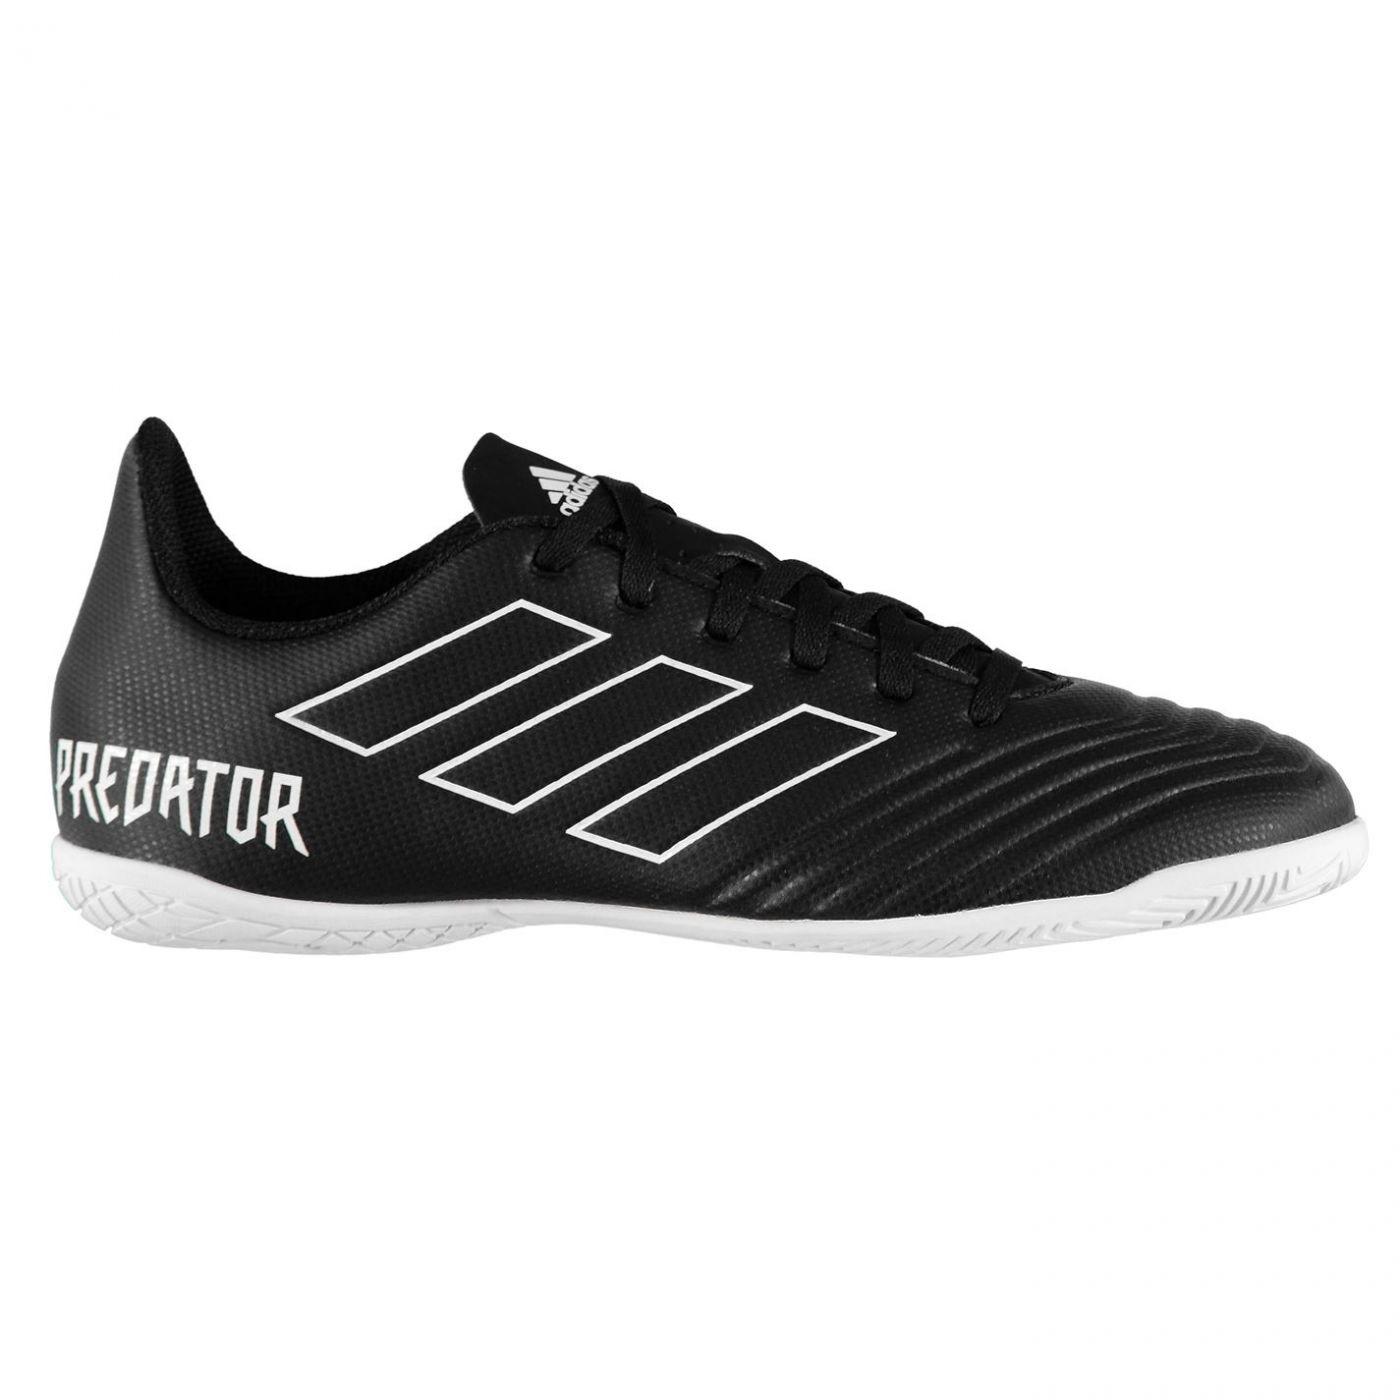 Adidas Predator 18.4 Mens Indoor Football Trainers